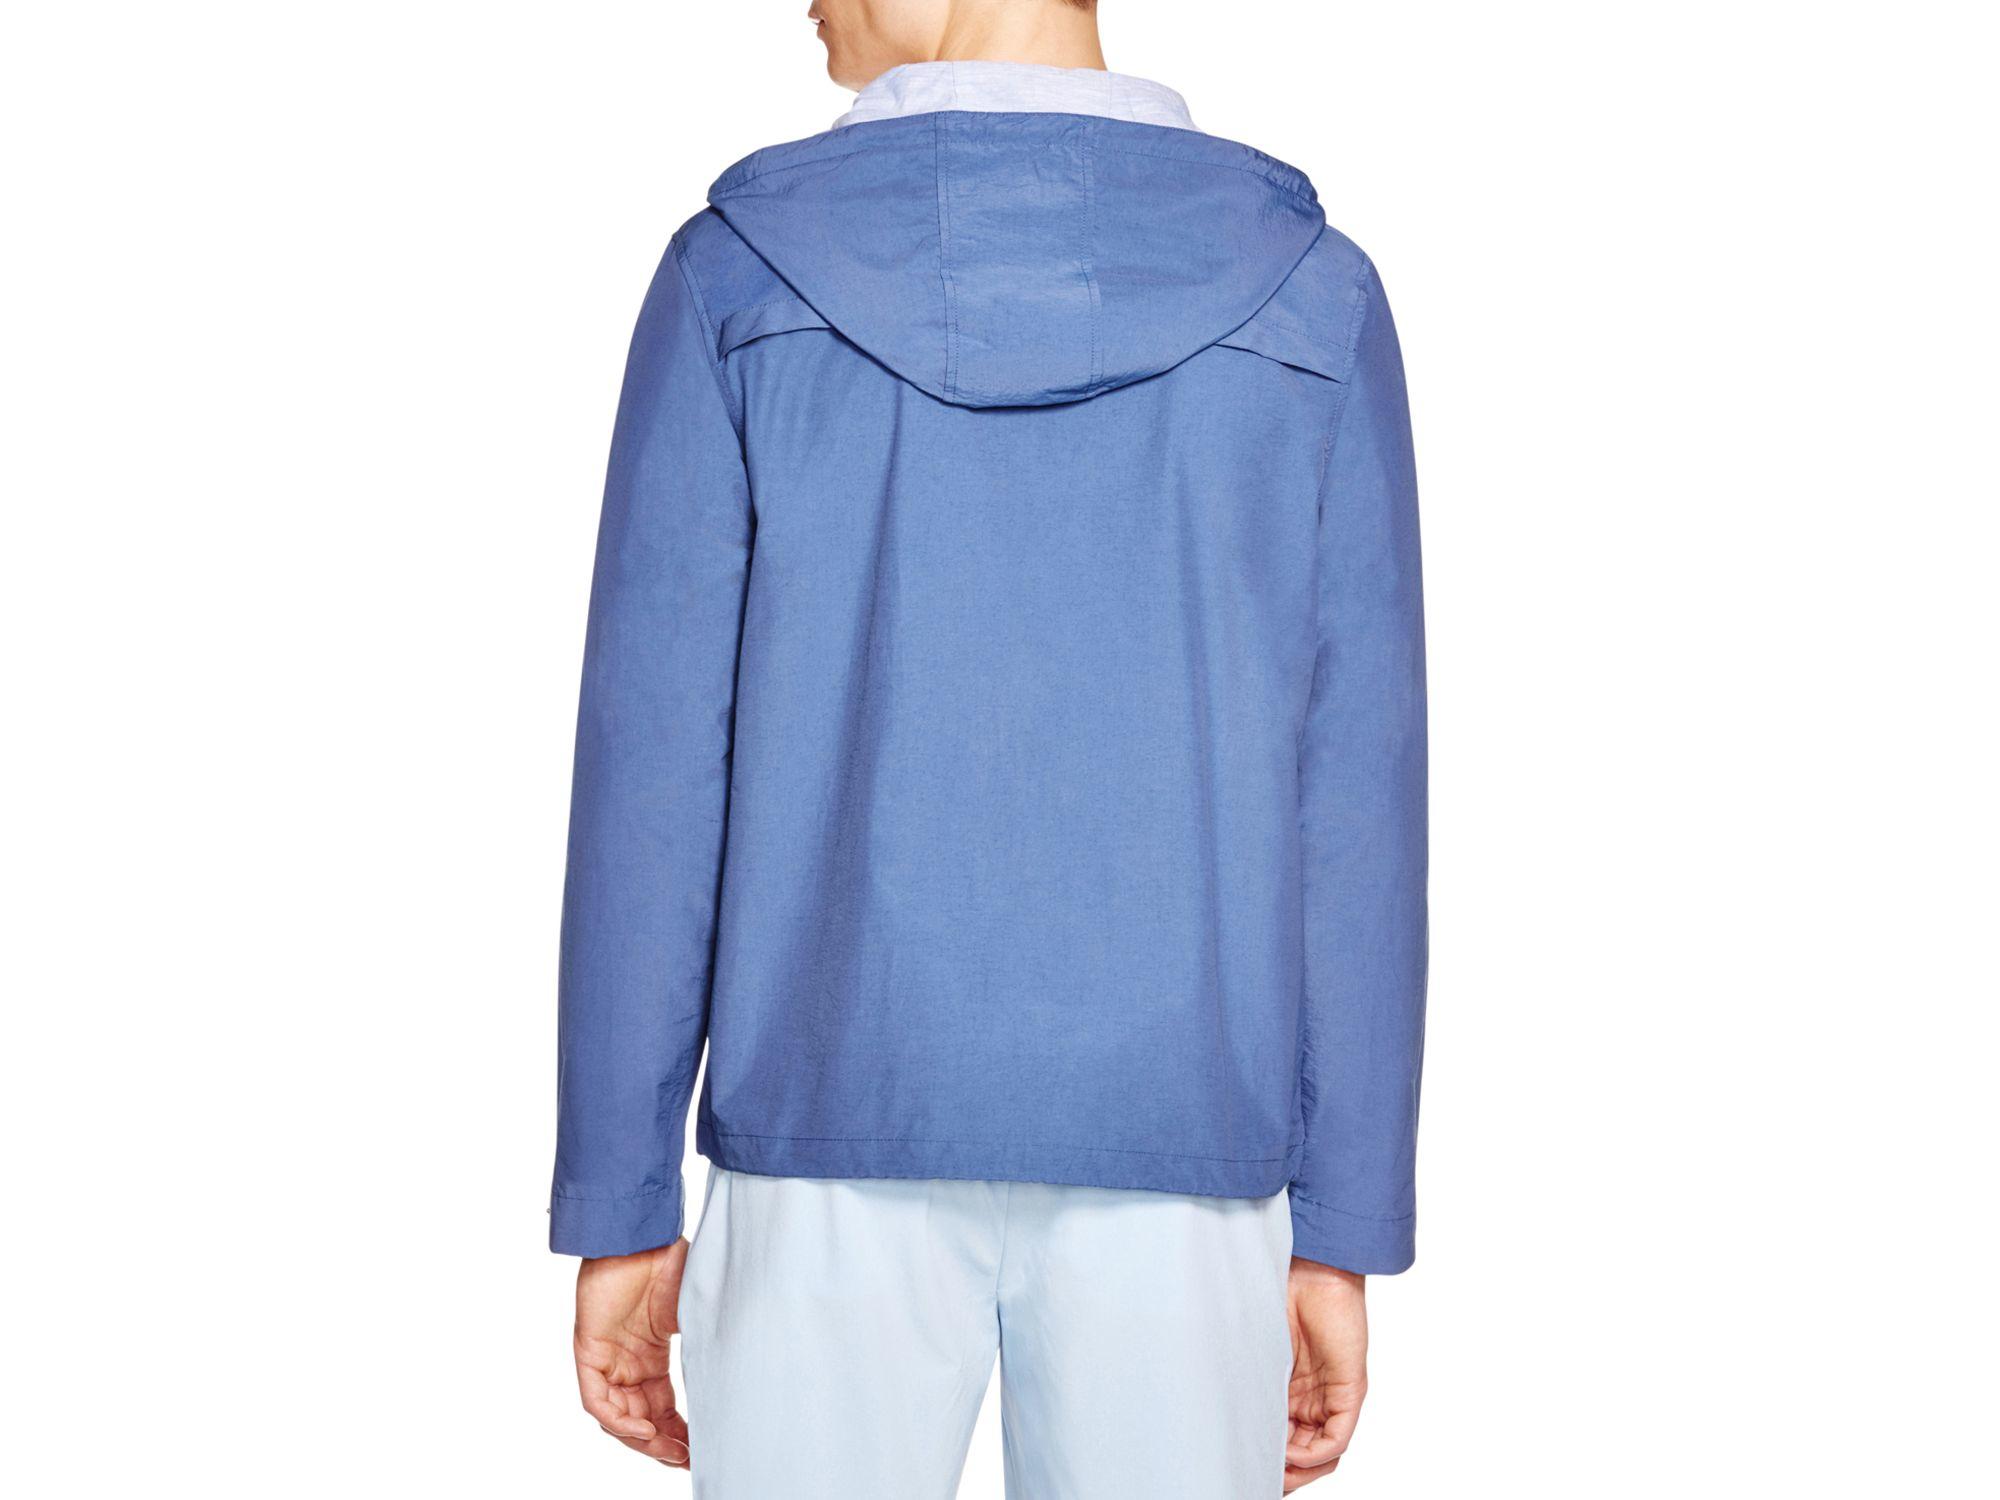 Vineyard Vines Cotton Nautical Jacket in Blue for Men